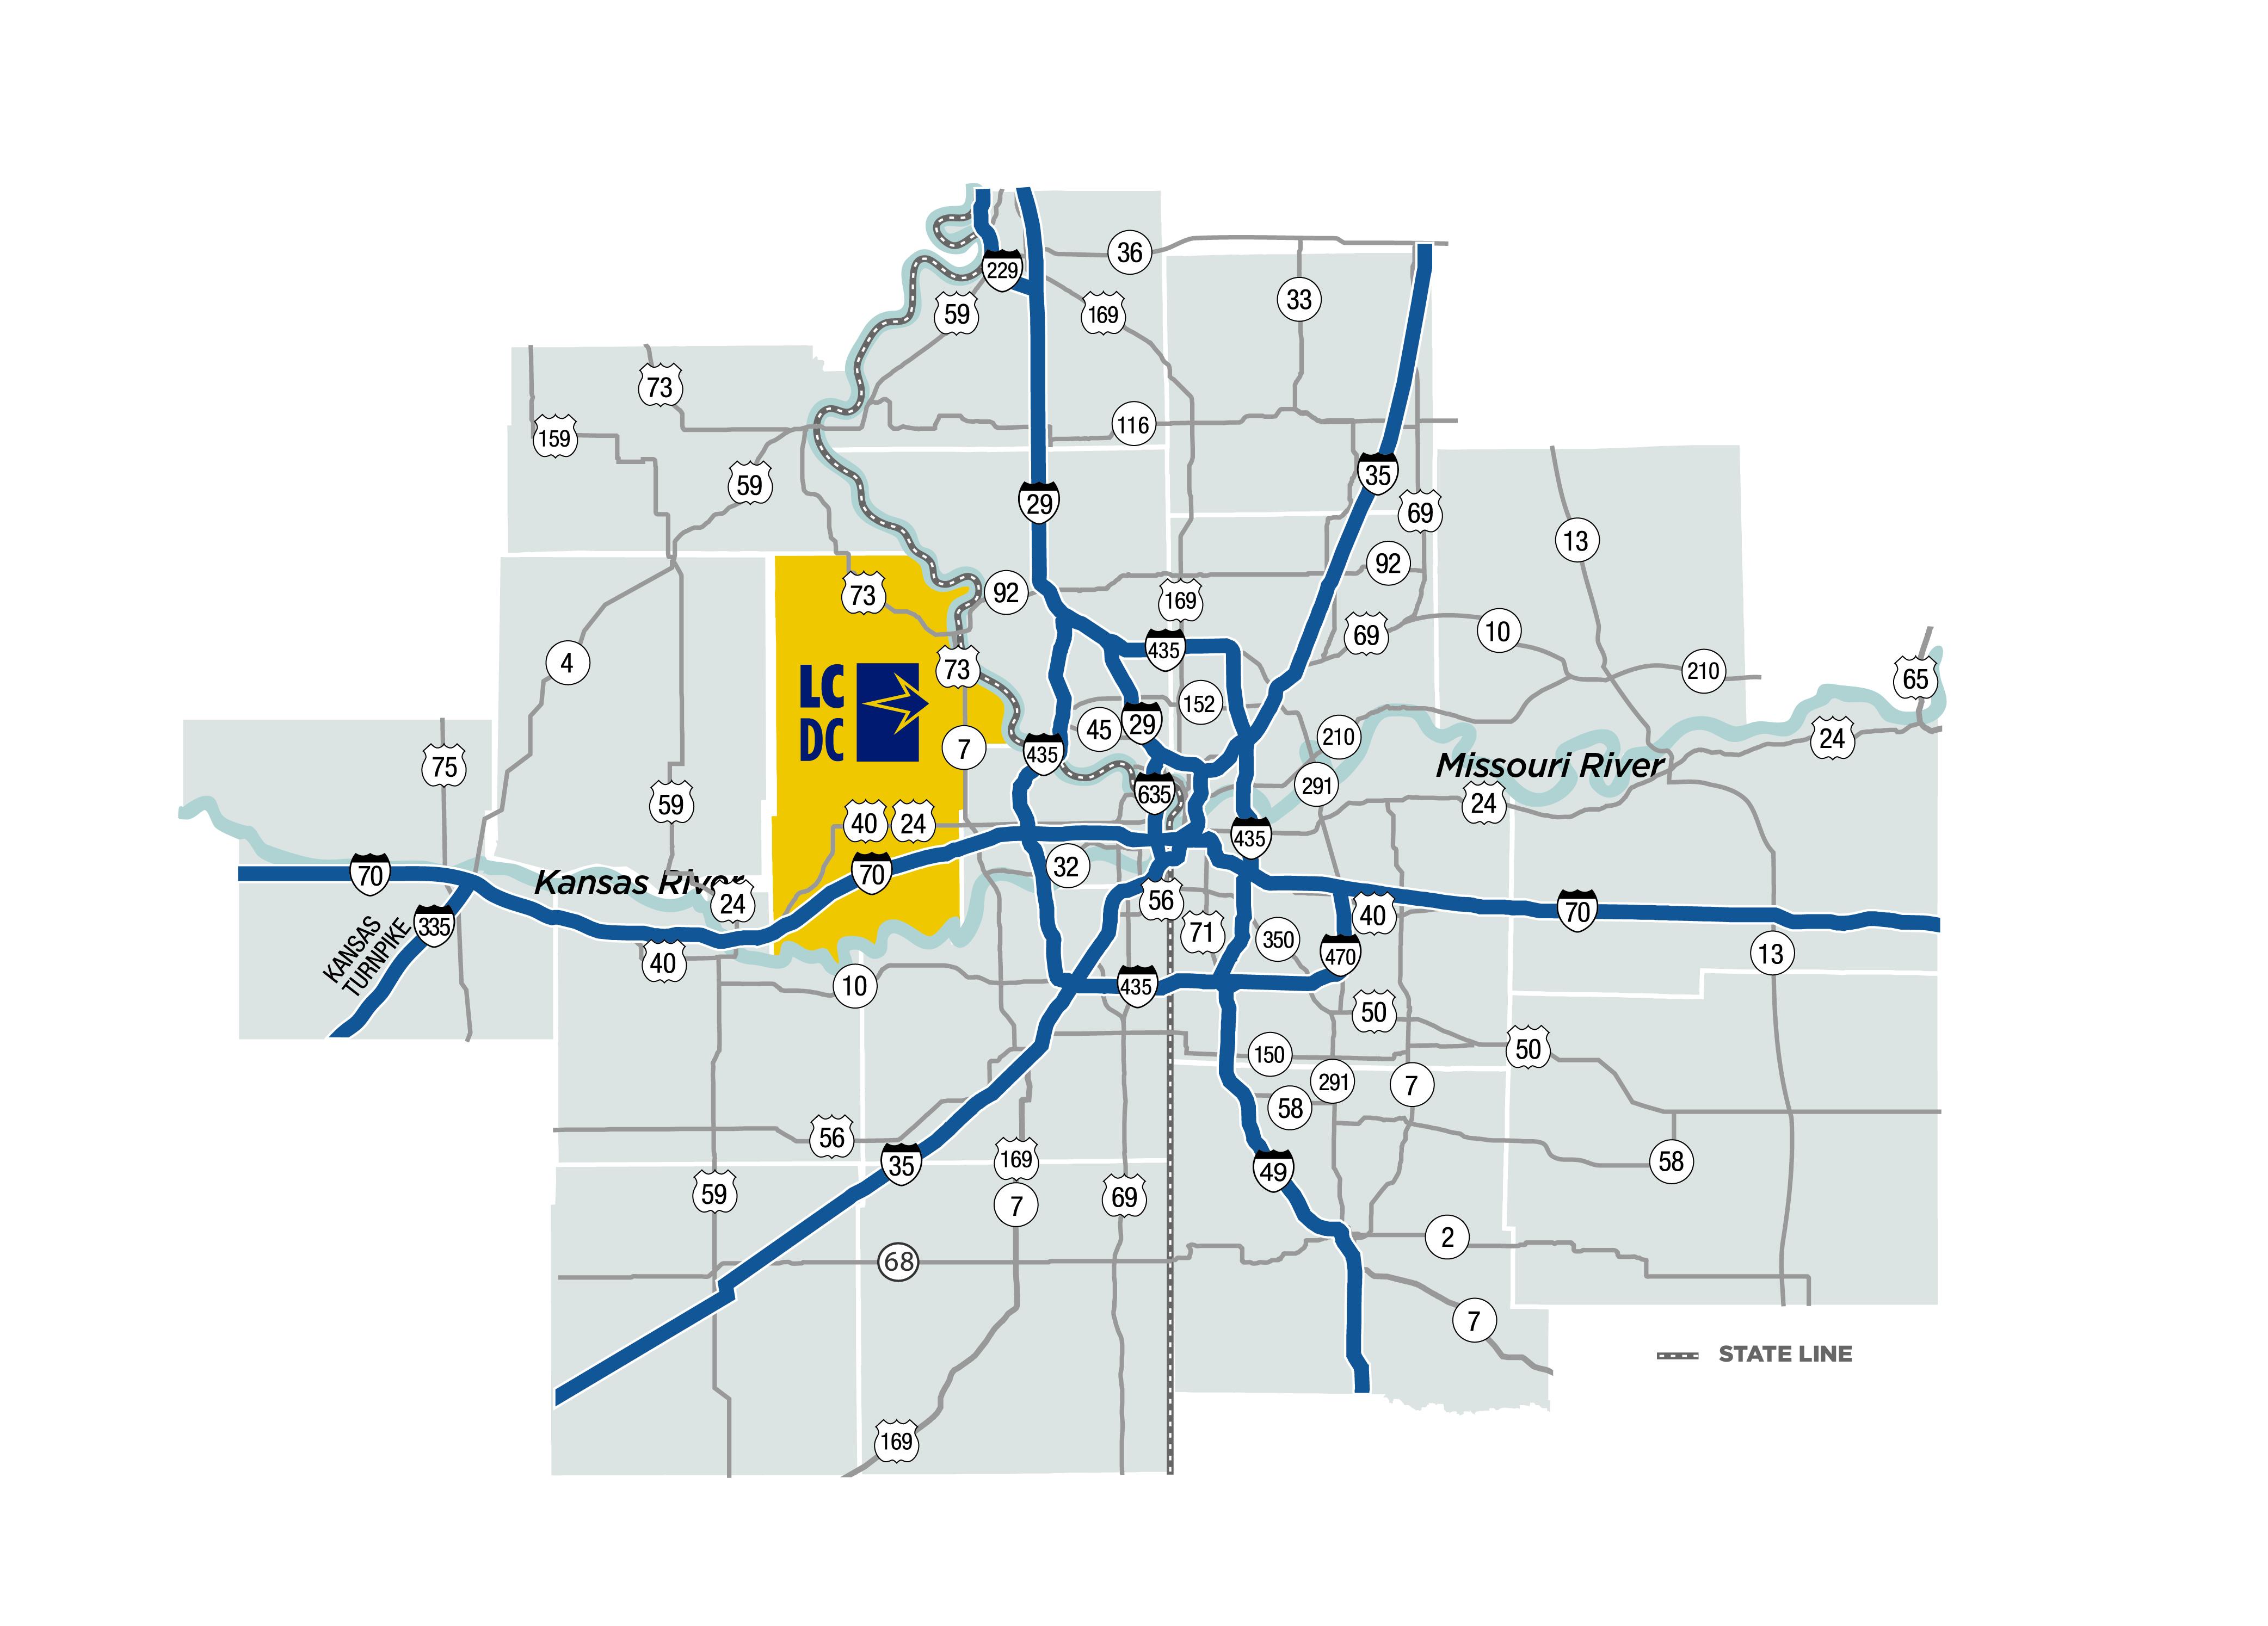 Transportation - Leavenworth County Development Corporation on atlas road map, st. petersburg road map, fort smith road map, lawrence kansas road map, state of kansas road map, new haven road map, minneapolis st paul road map, goshen county road map, western kansas road map, berkeley road map, kailua road map, southern il road map, st. louis area road map, lake of the ozarks road map, st louis metro road map, south puget sound road map, webster county road map, new york city area road map, christian county road map, long beach road map,